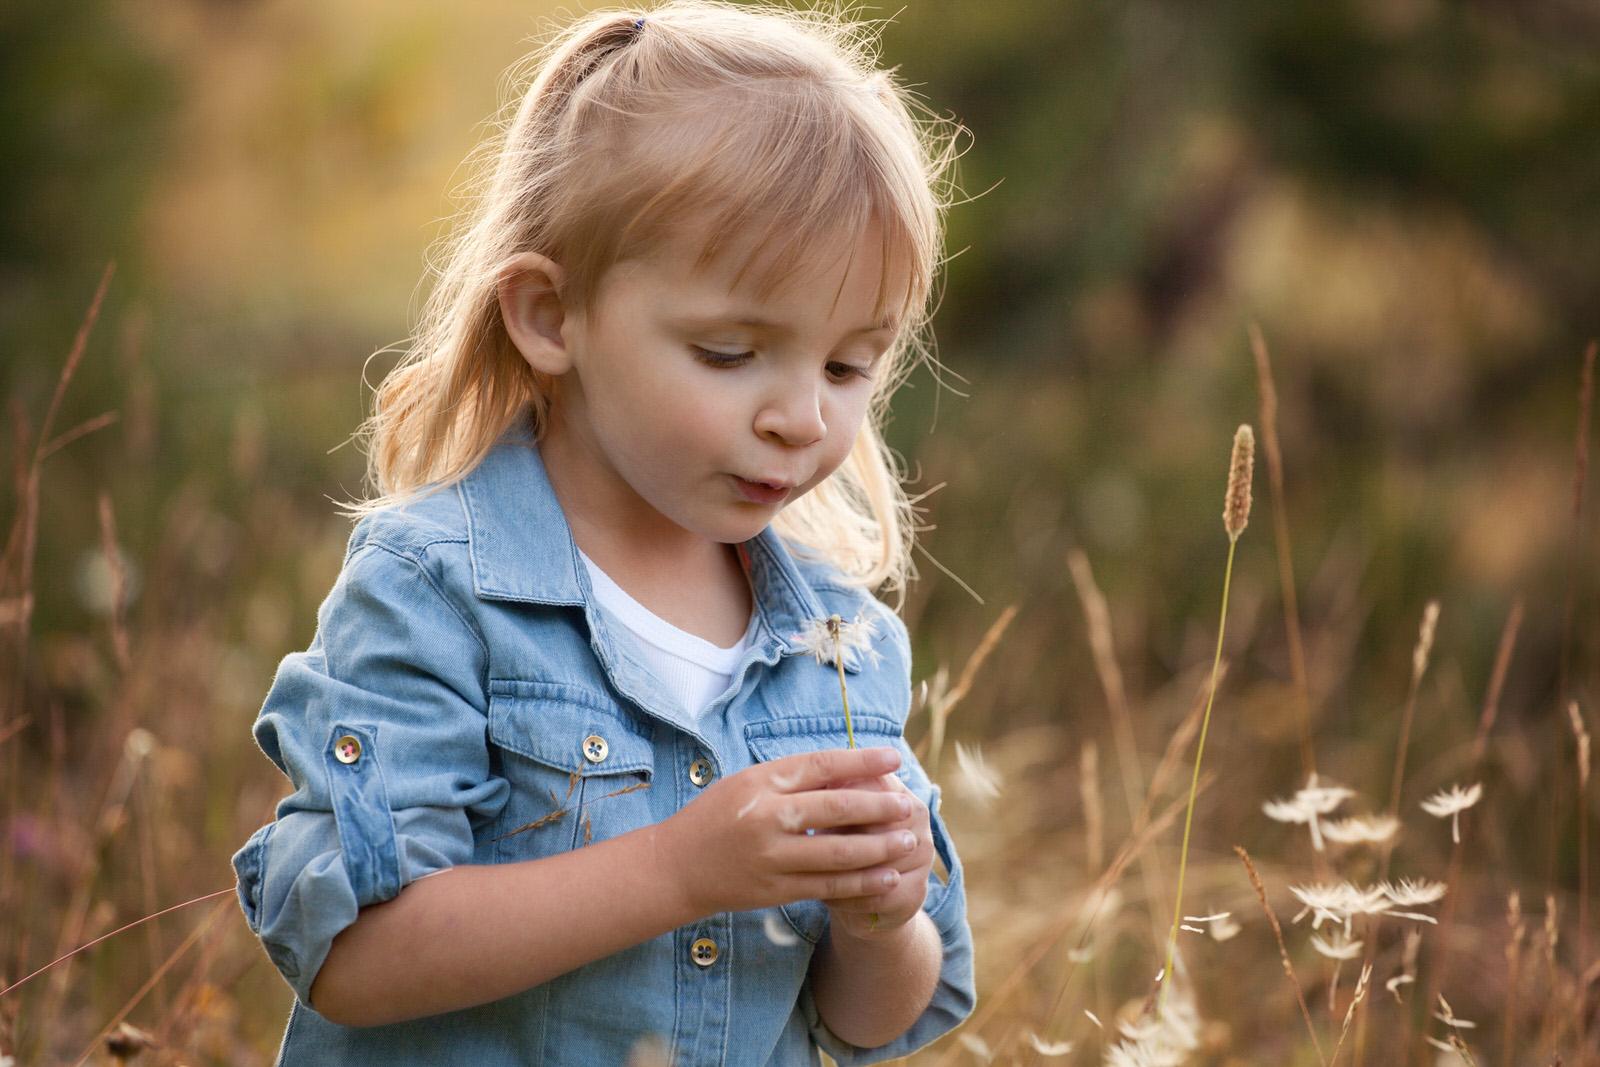 upper-peninsula-photographer-family-children-marquette-michigan-jackie-solomon-005.jpg